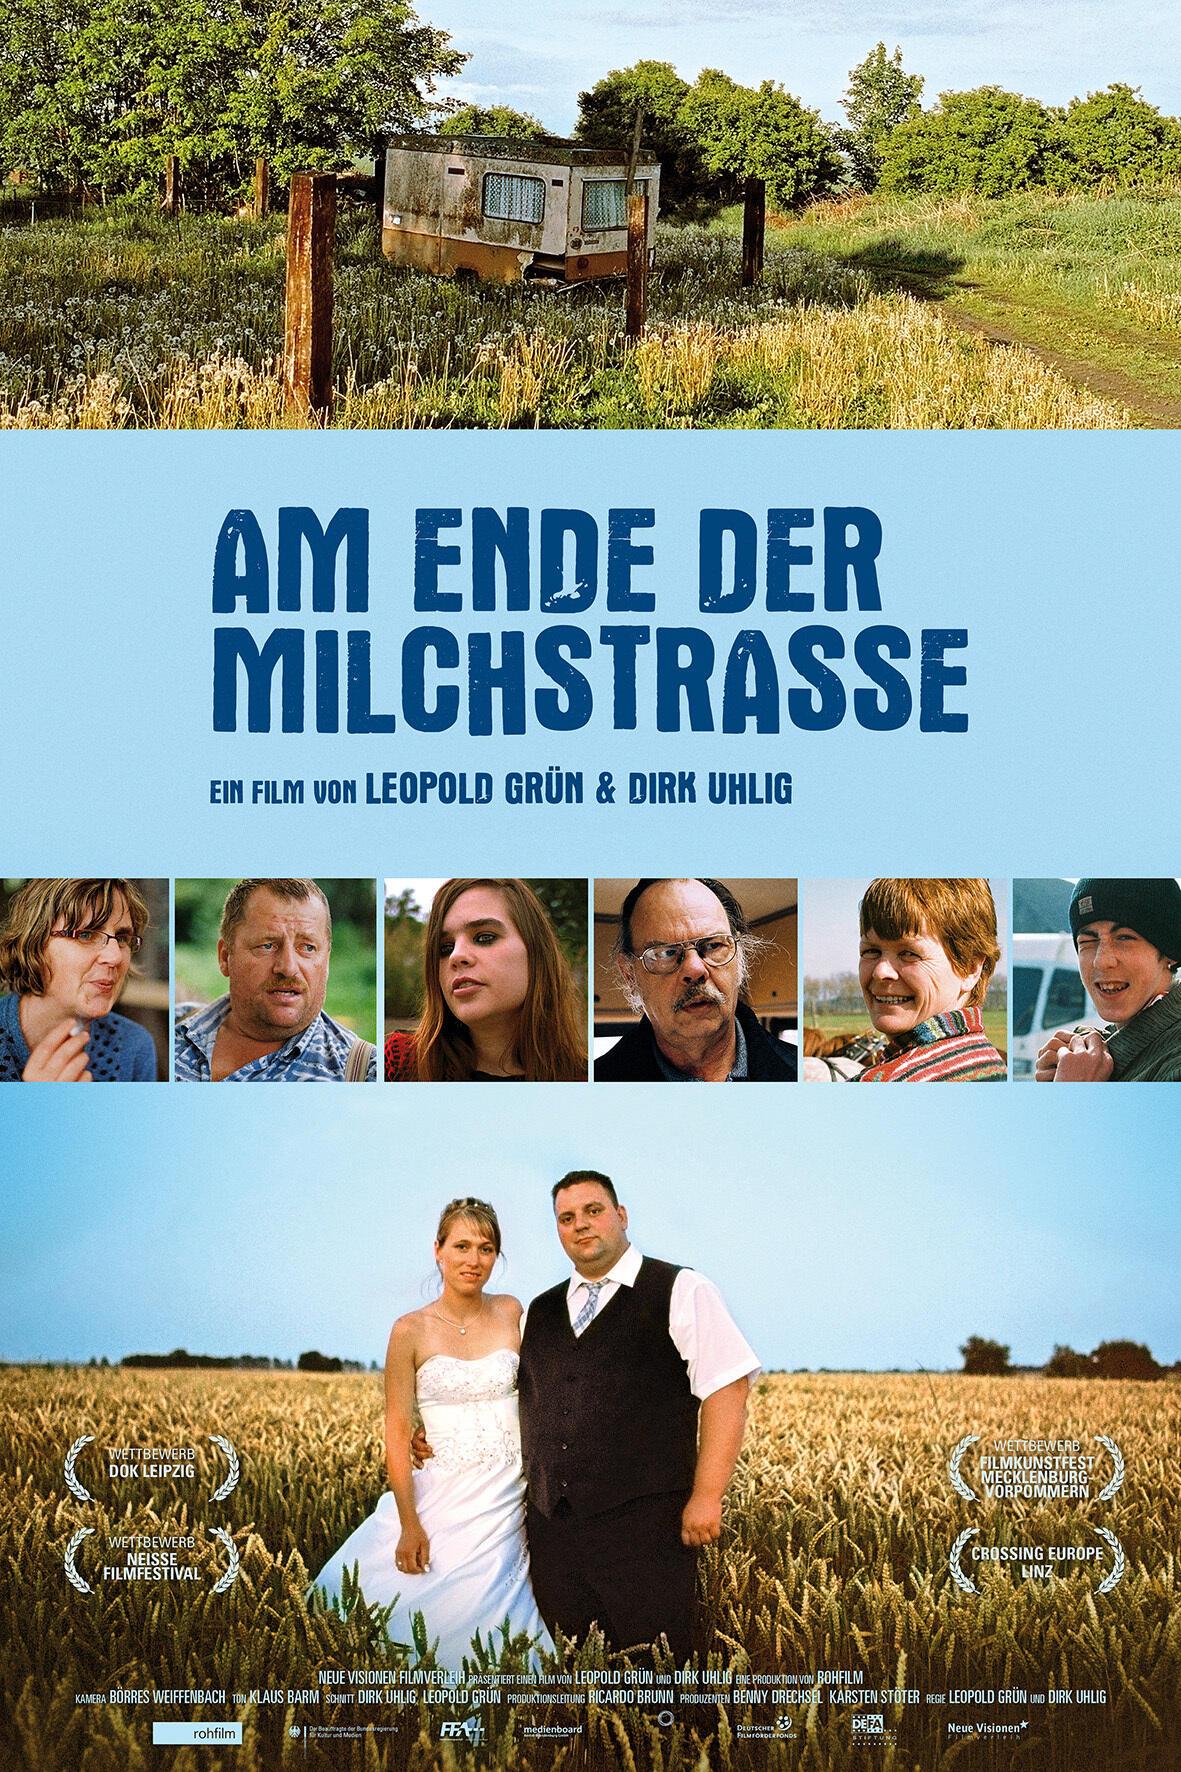 Am Ende der Milchstraße | Film 2012 | moviepilot.de